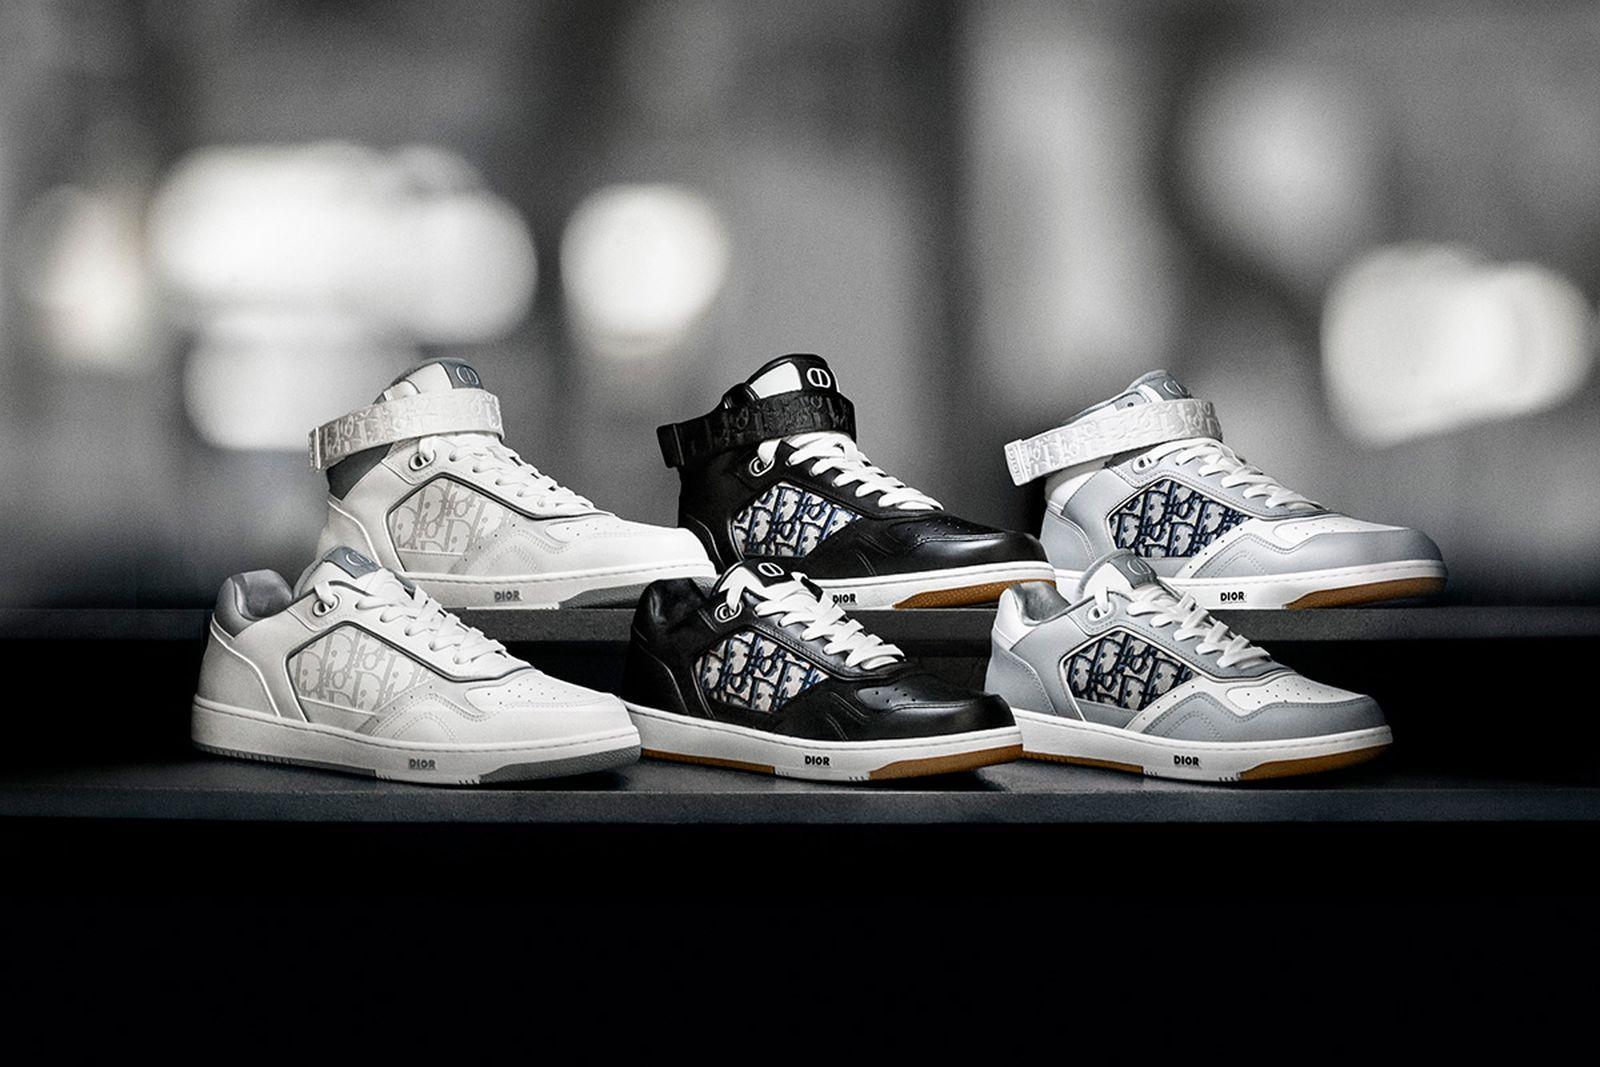 dior-b27-sneaker-release-date-price-new-06